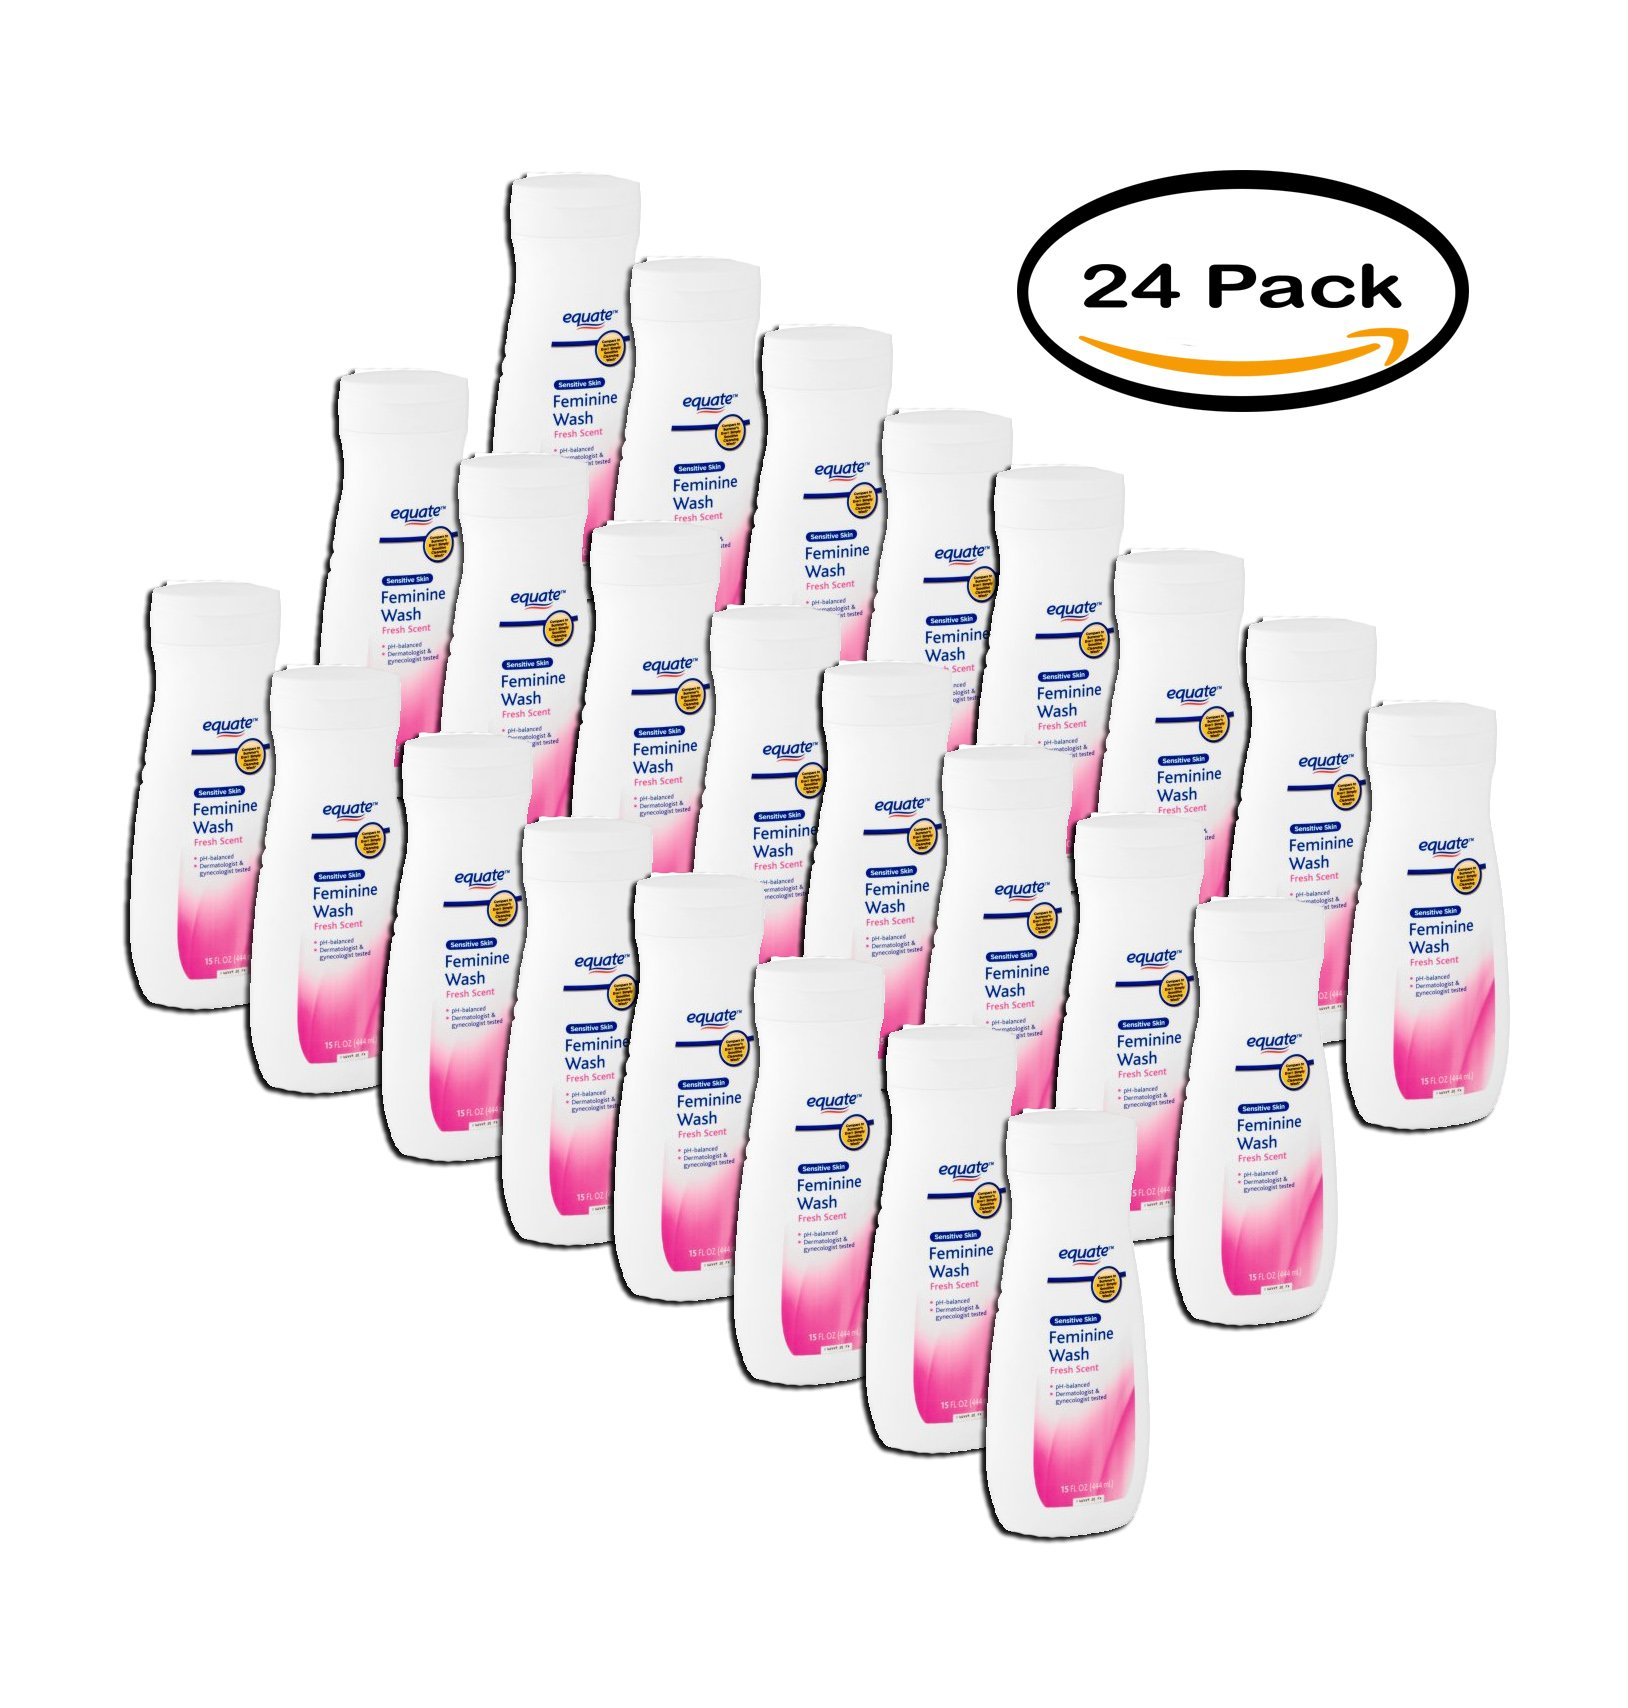 PACK OF 24 - Equate Sensitive Skin Fresh Scent Feminine Wash, 15 fl oz